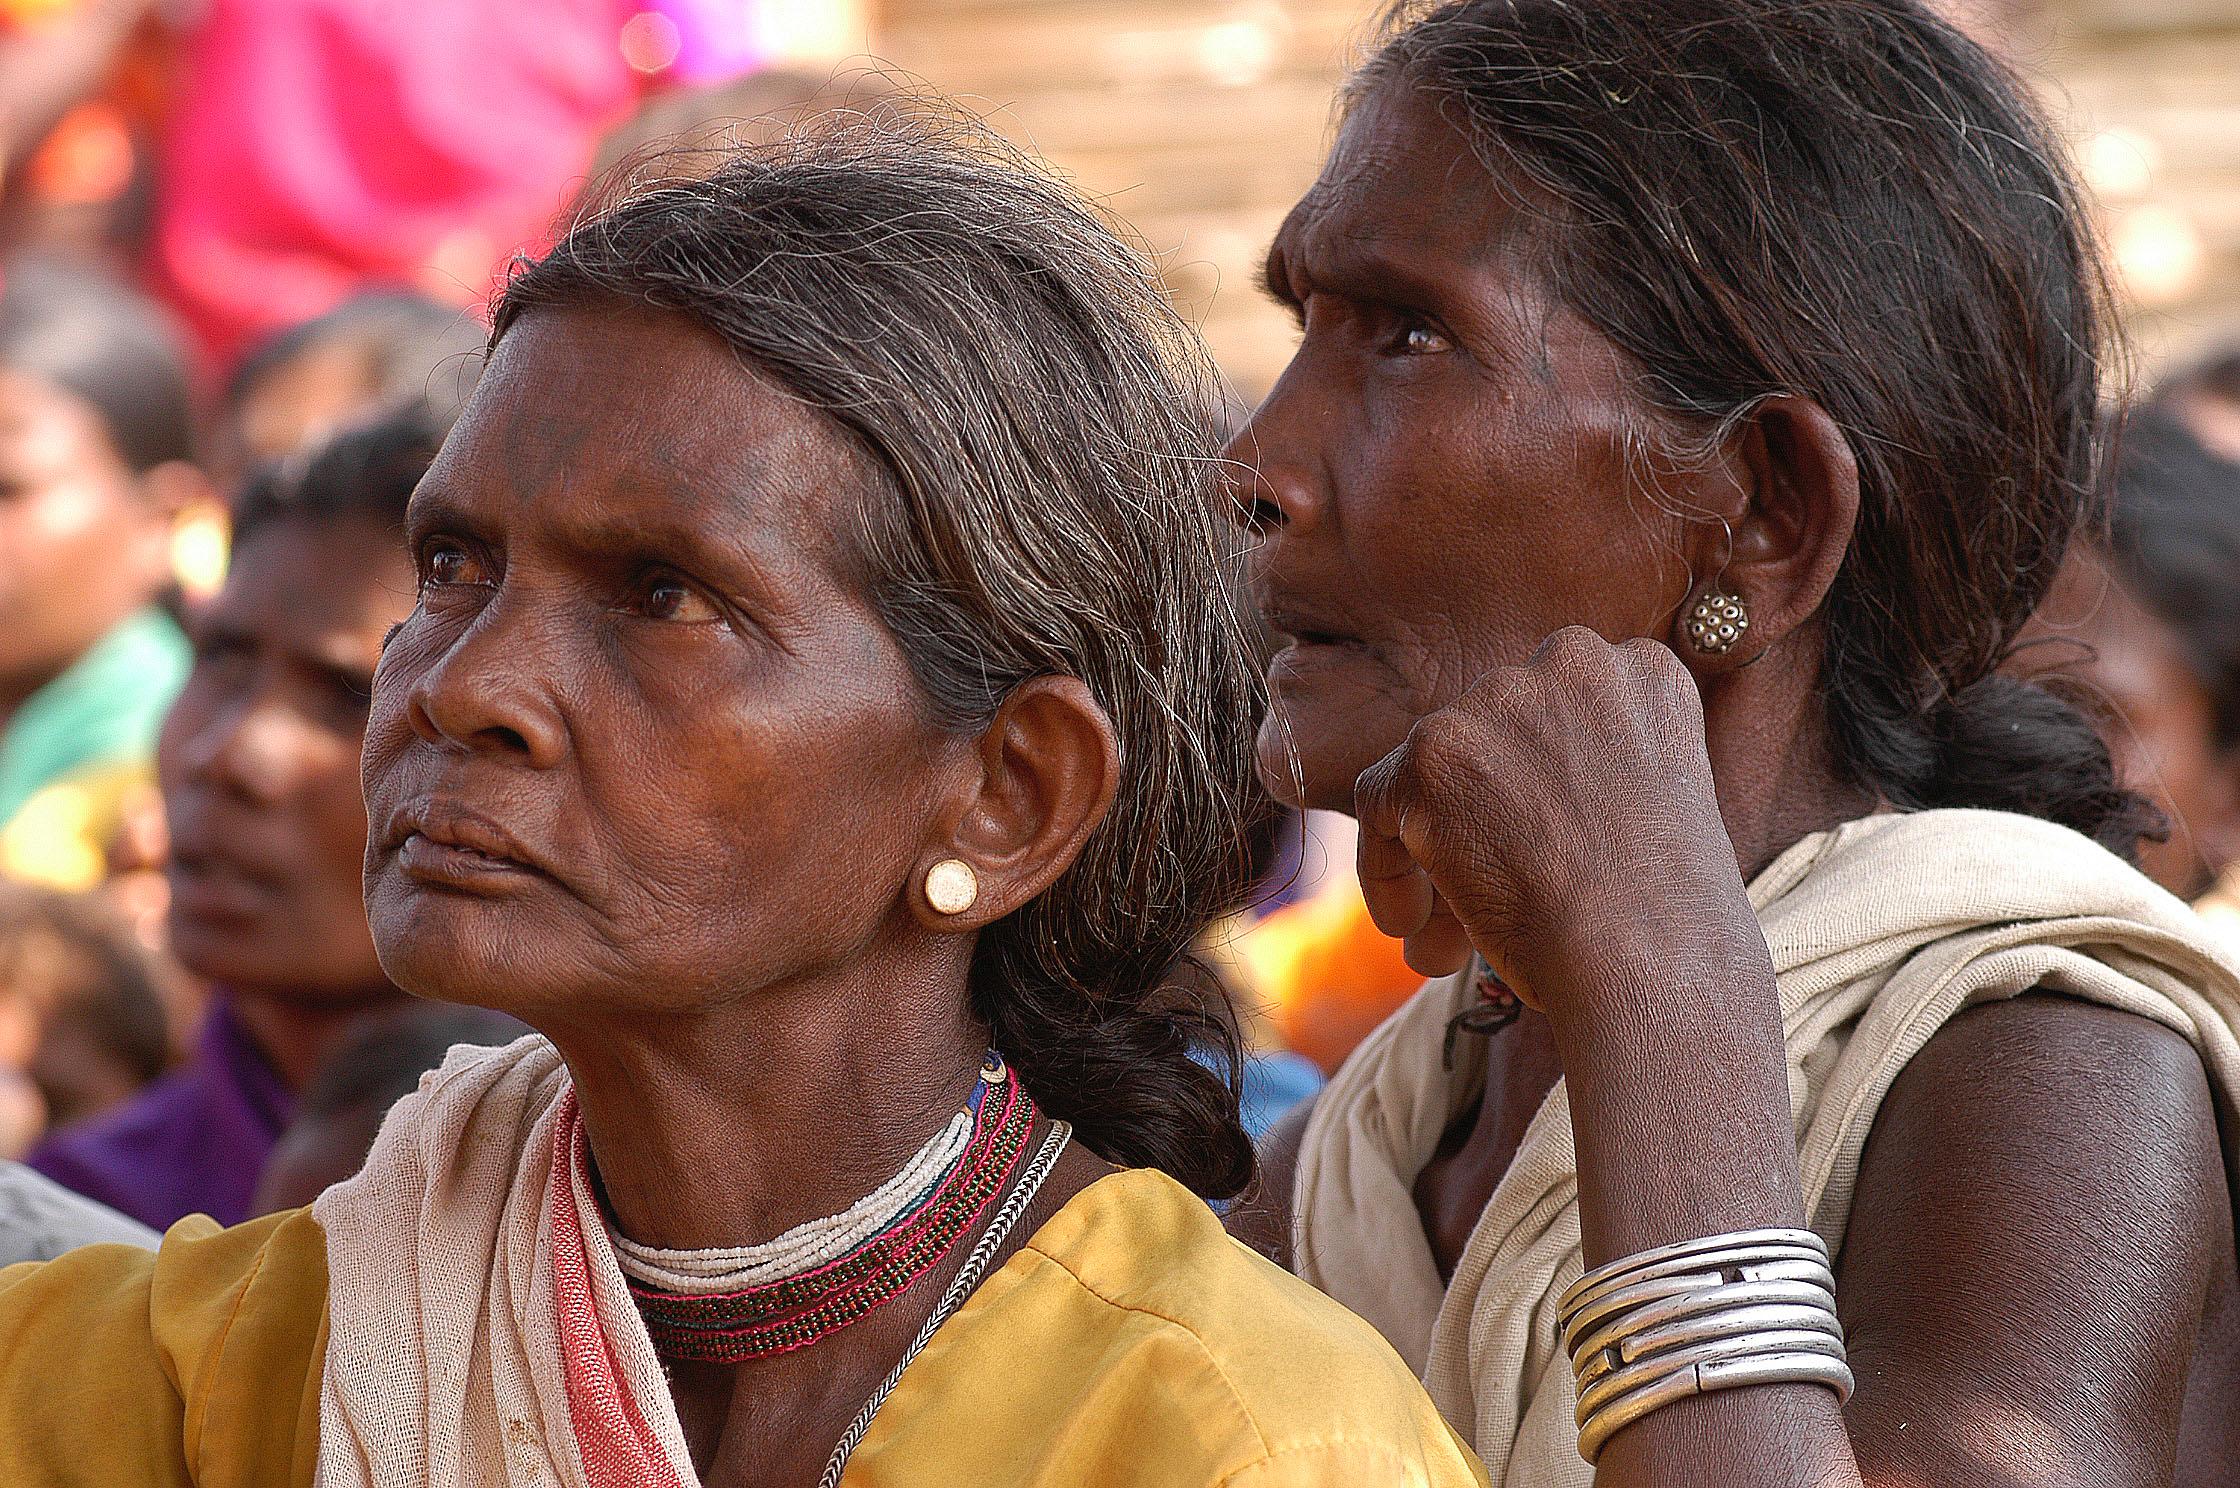 Marriage or Inheritance: The Strange choice before daughters of Uttar Pradesh, India